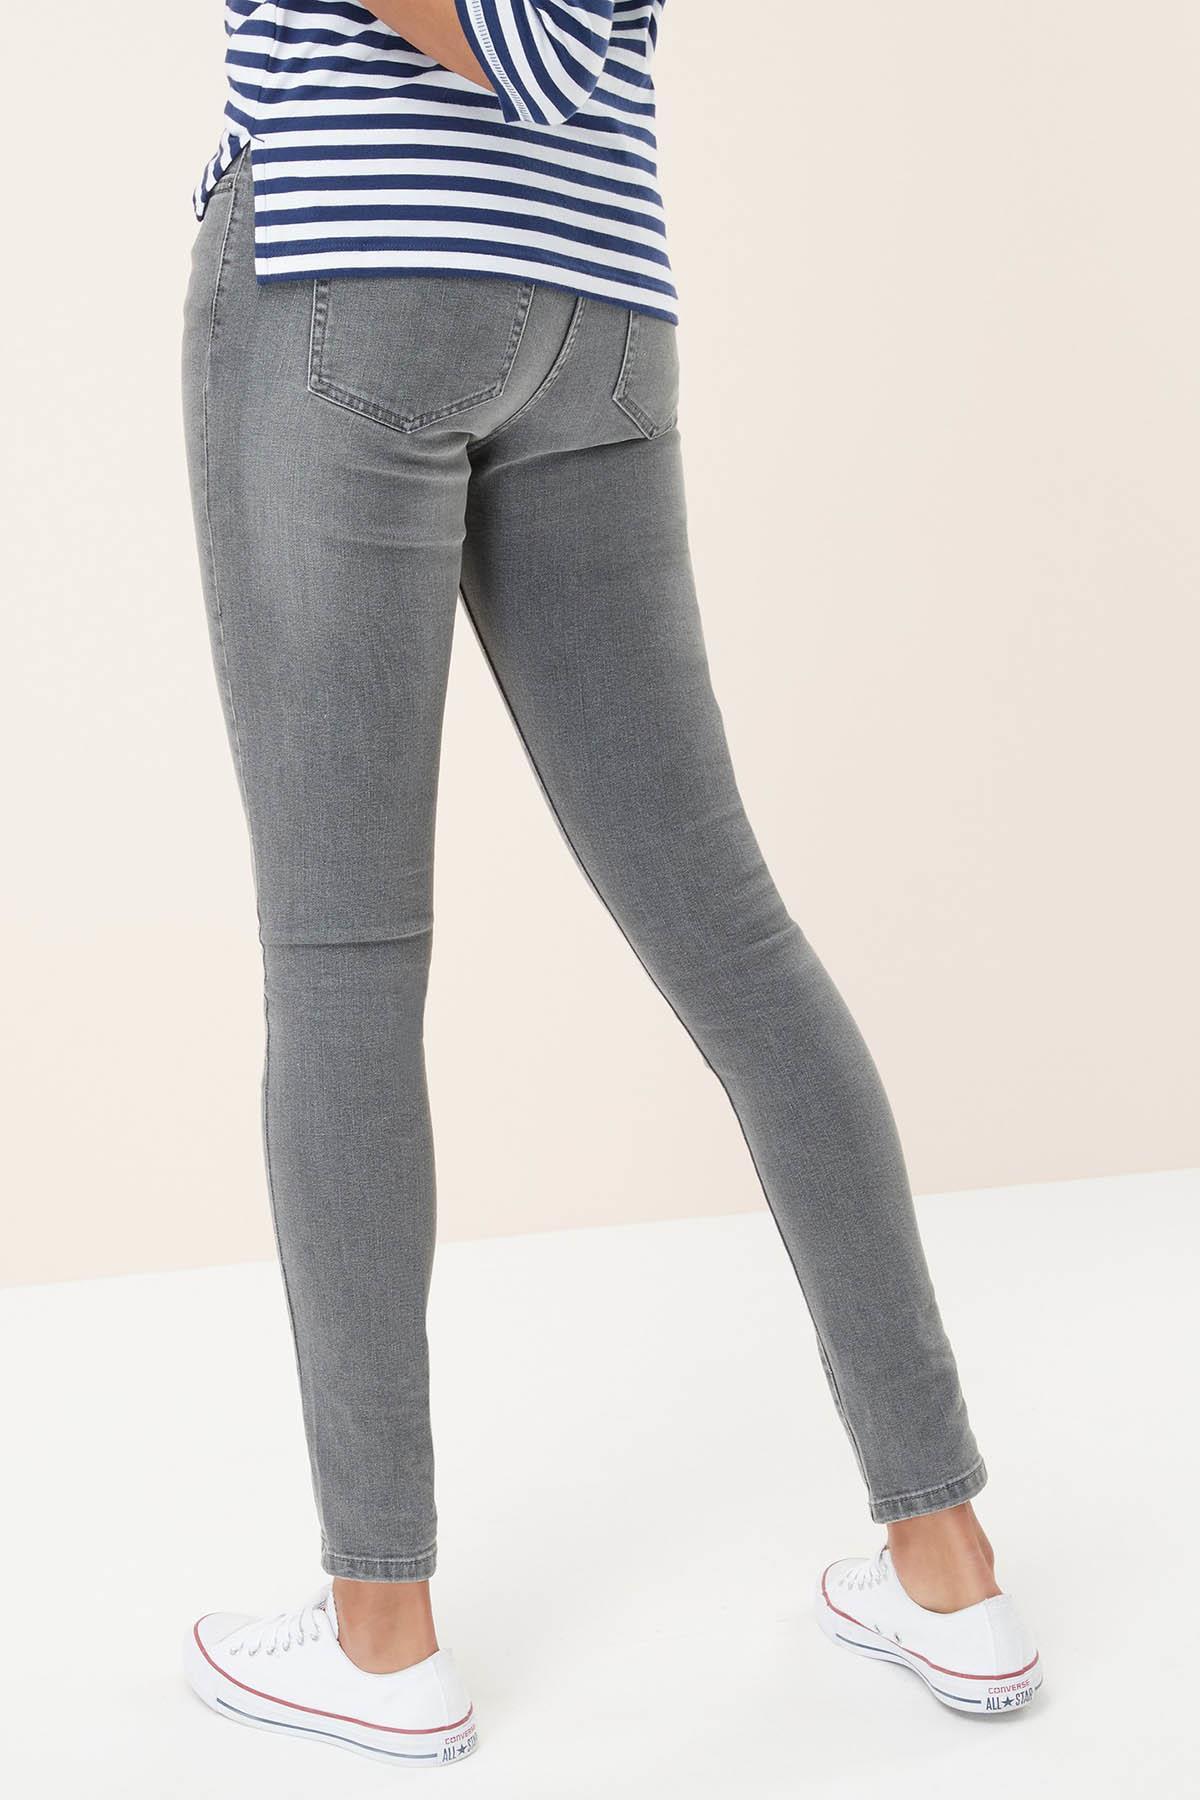 Ladies-Skinny-Jeans-New-ex-Next-Extra-Stretch-Size-6-18-Short-Reg-X-Long-Tall thumbnail 19